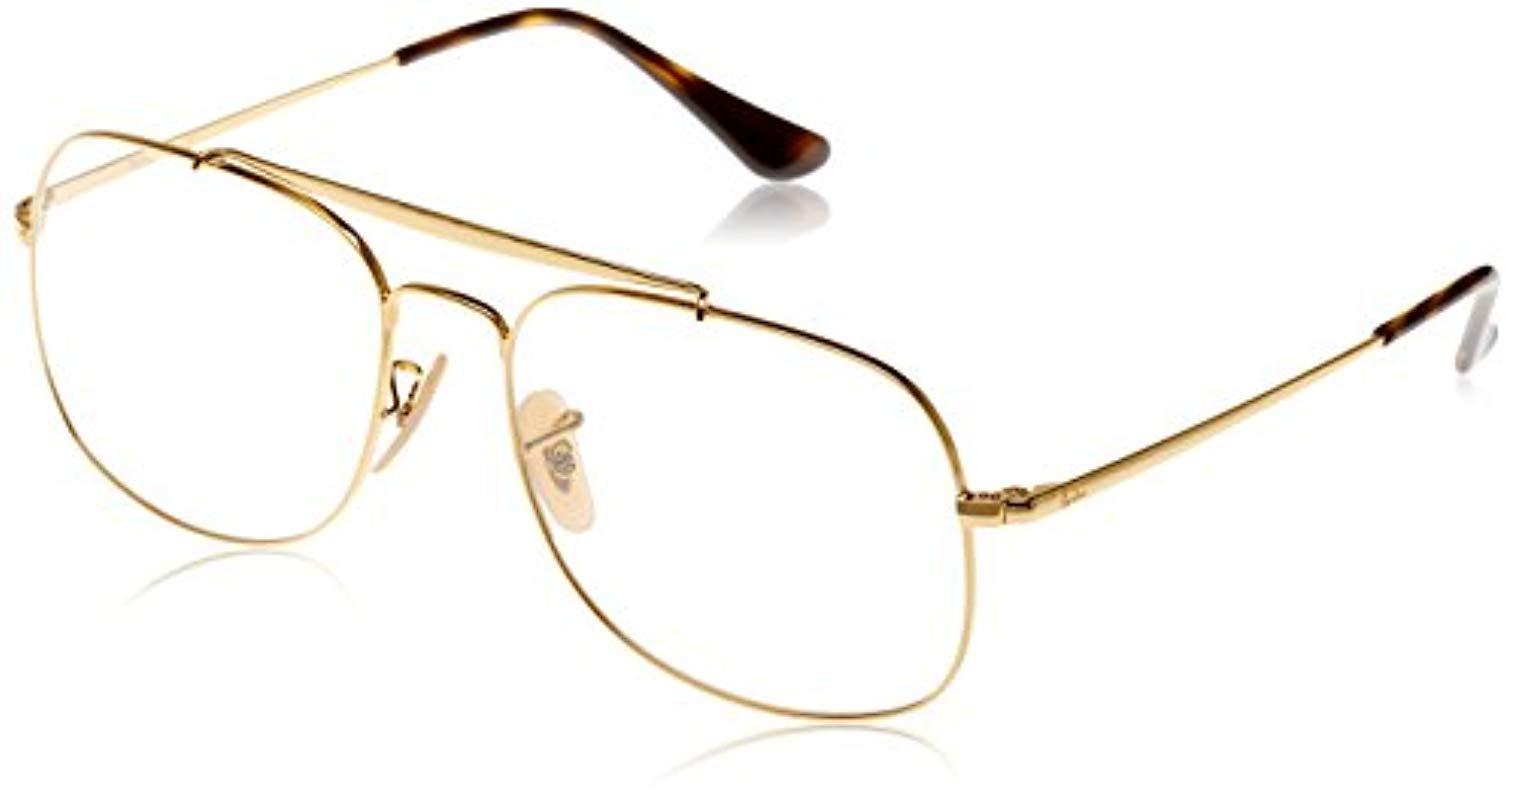 4ee120a9b64 Ray-Ban. Women s Metallic 0rx 6389 2500 57 Optical Frames